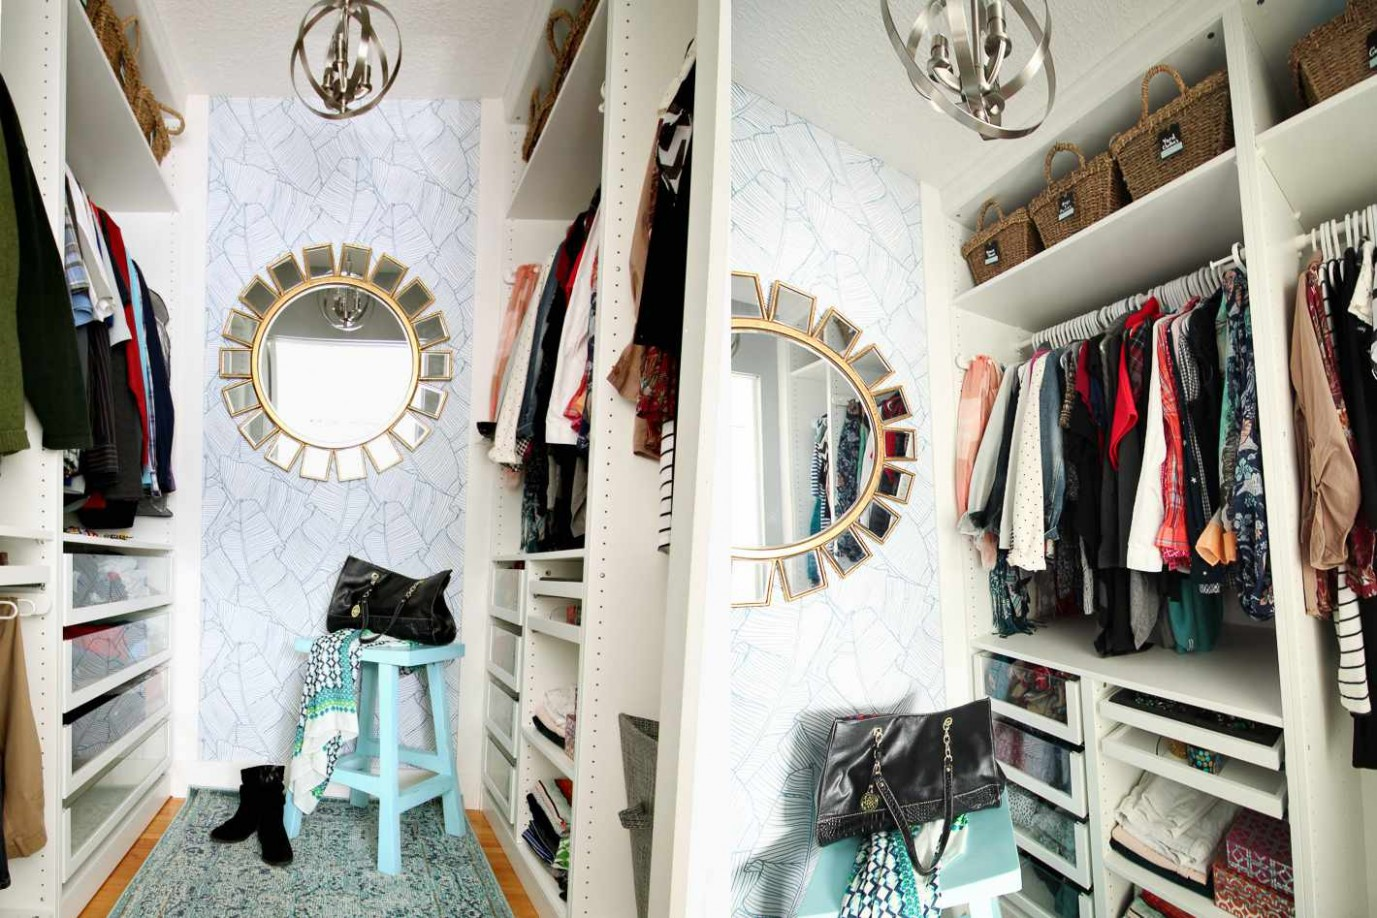 12 Best Small Walk-in Closet Storage Ideas for Bedrooms - Closet Ideas For Small Bedrooms